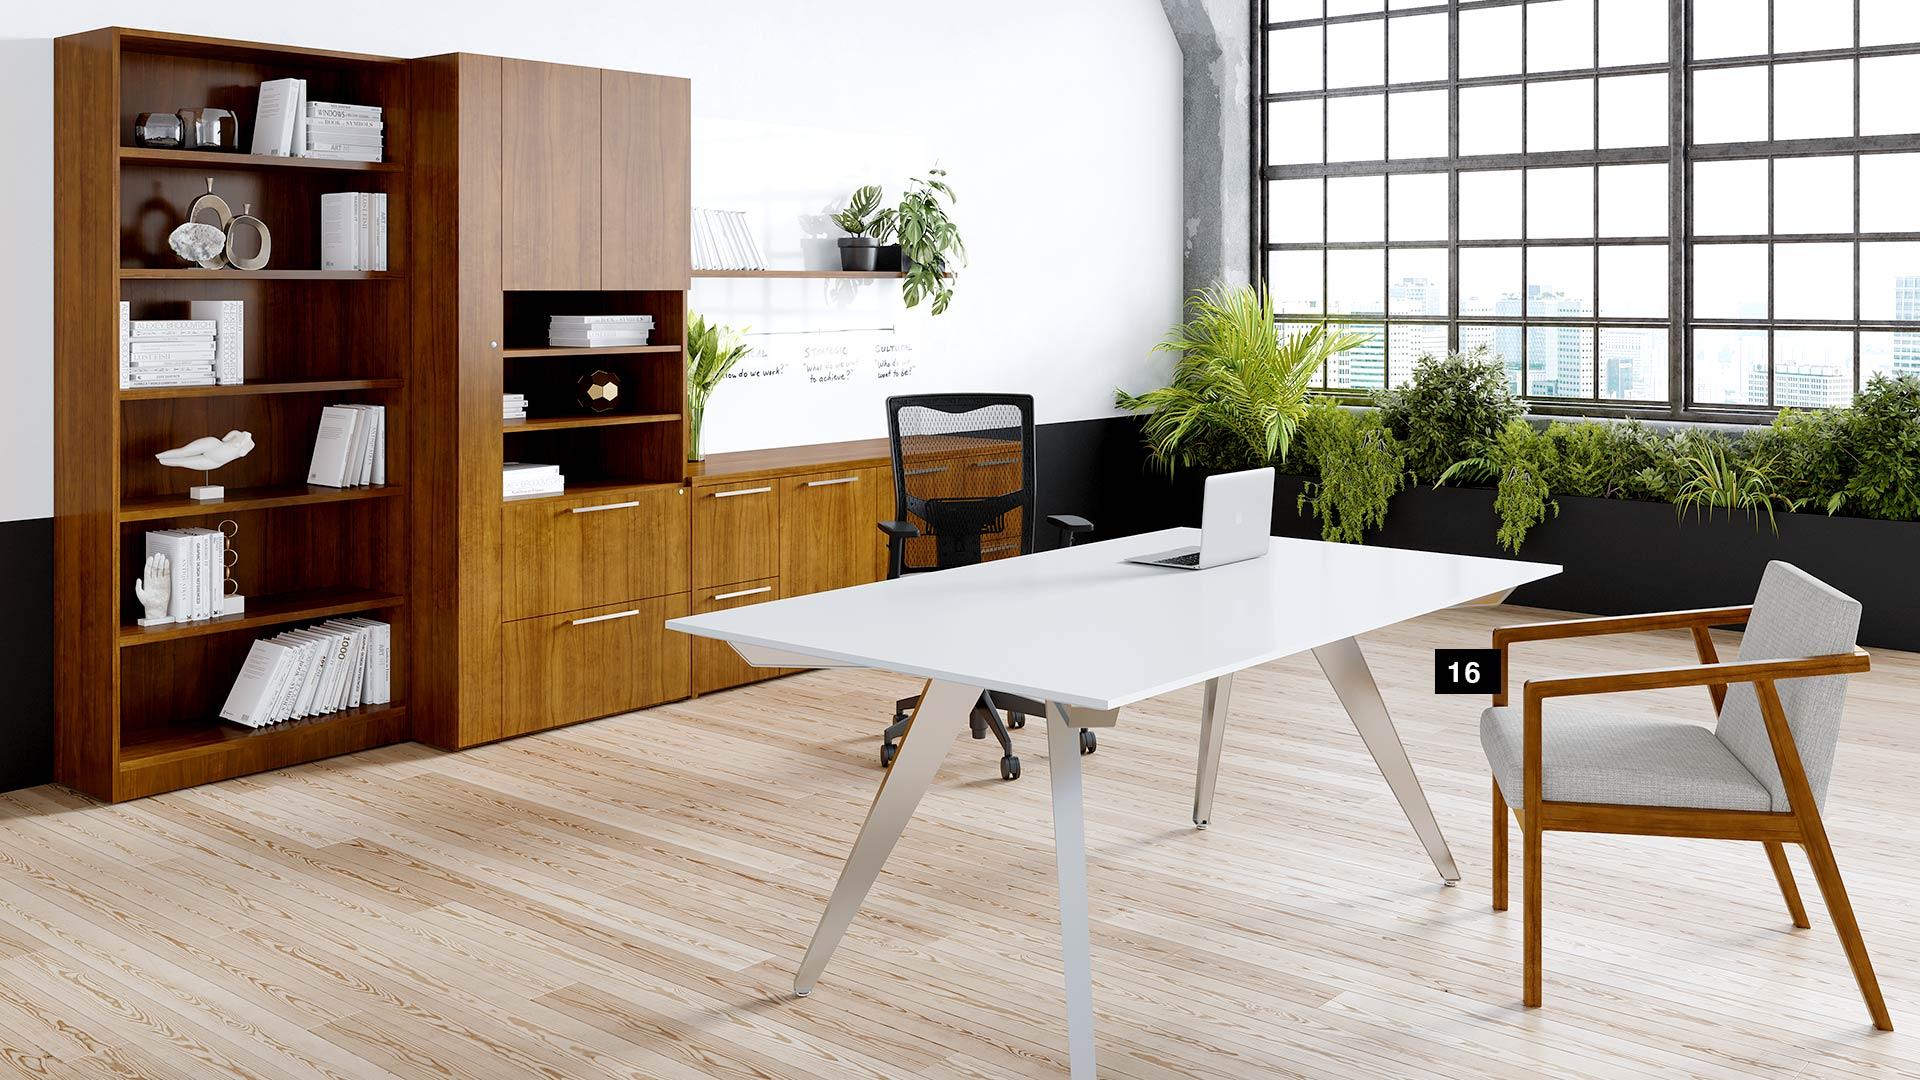 green-office-indiana-strut-table-legs